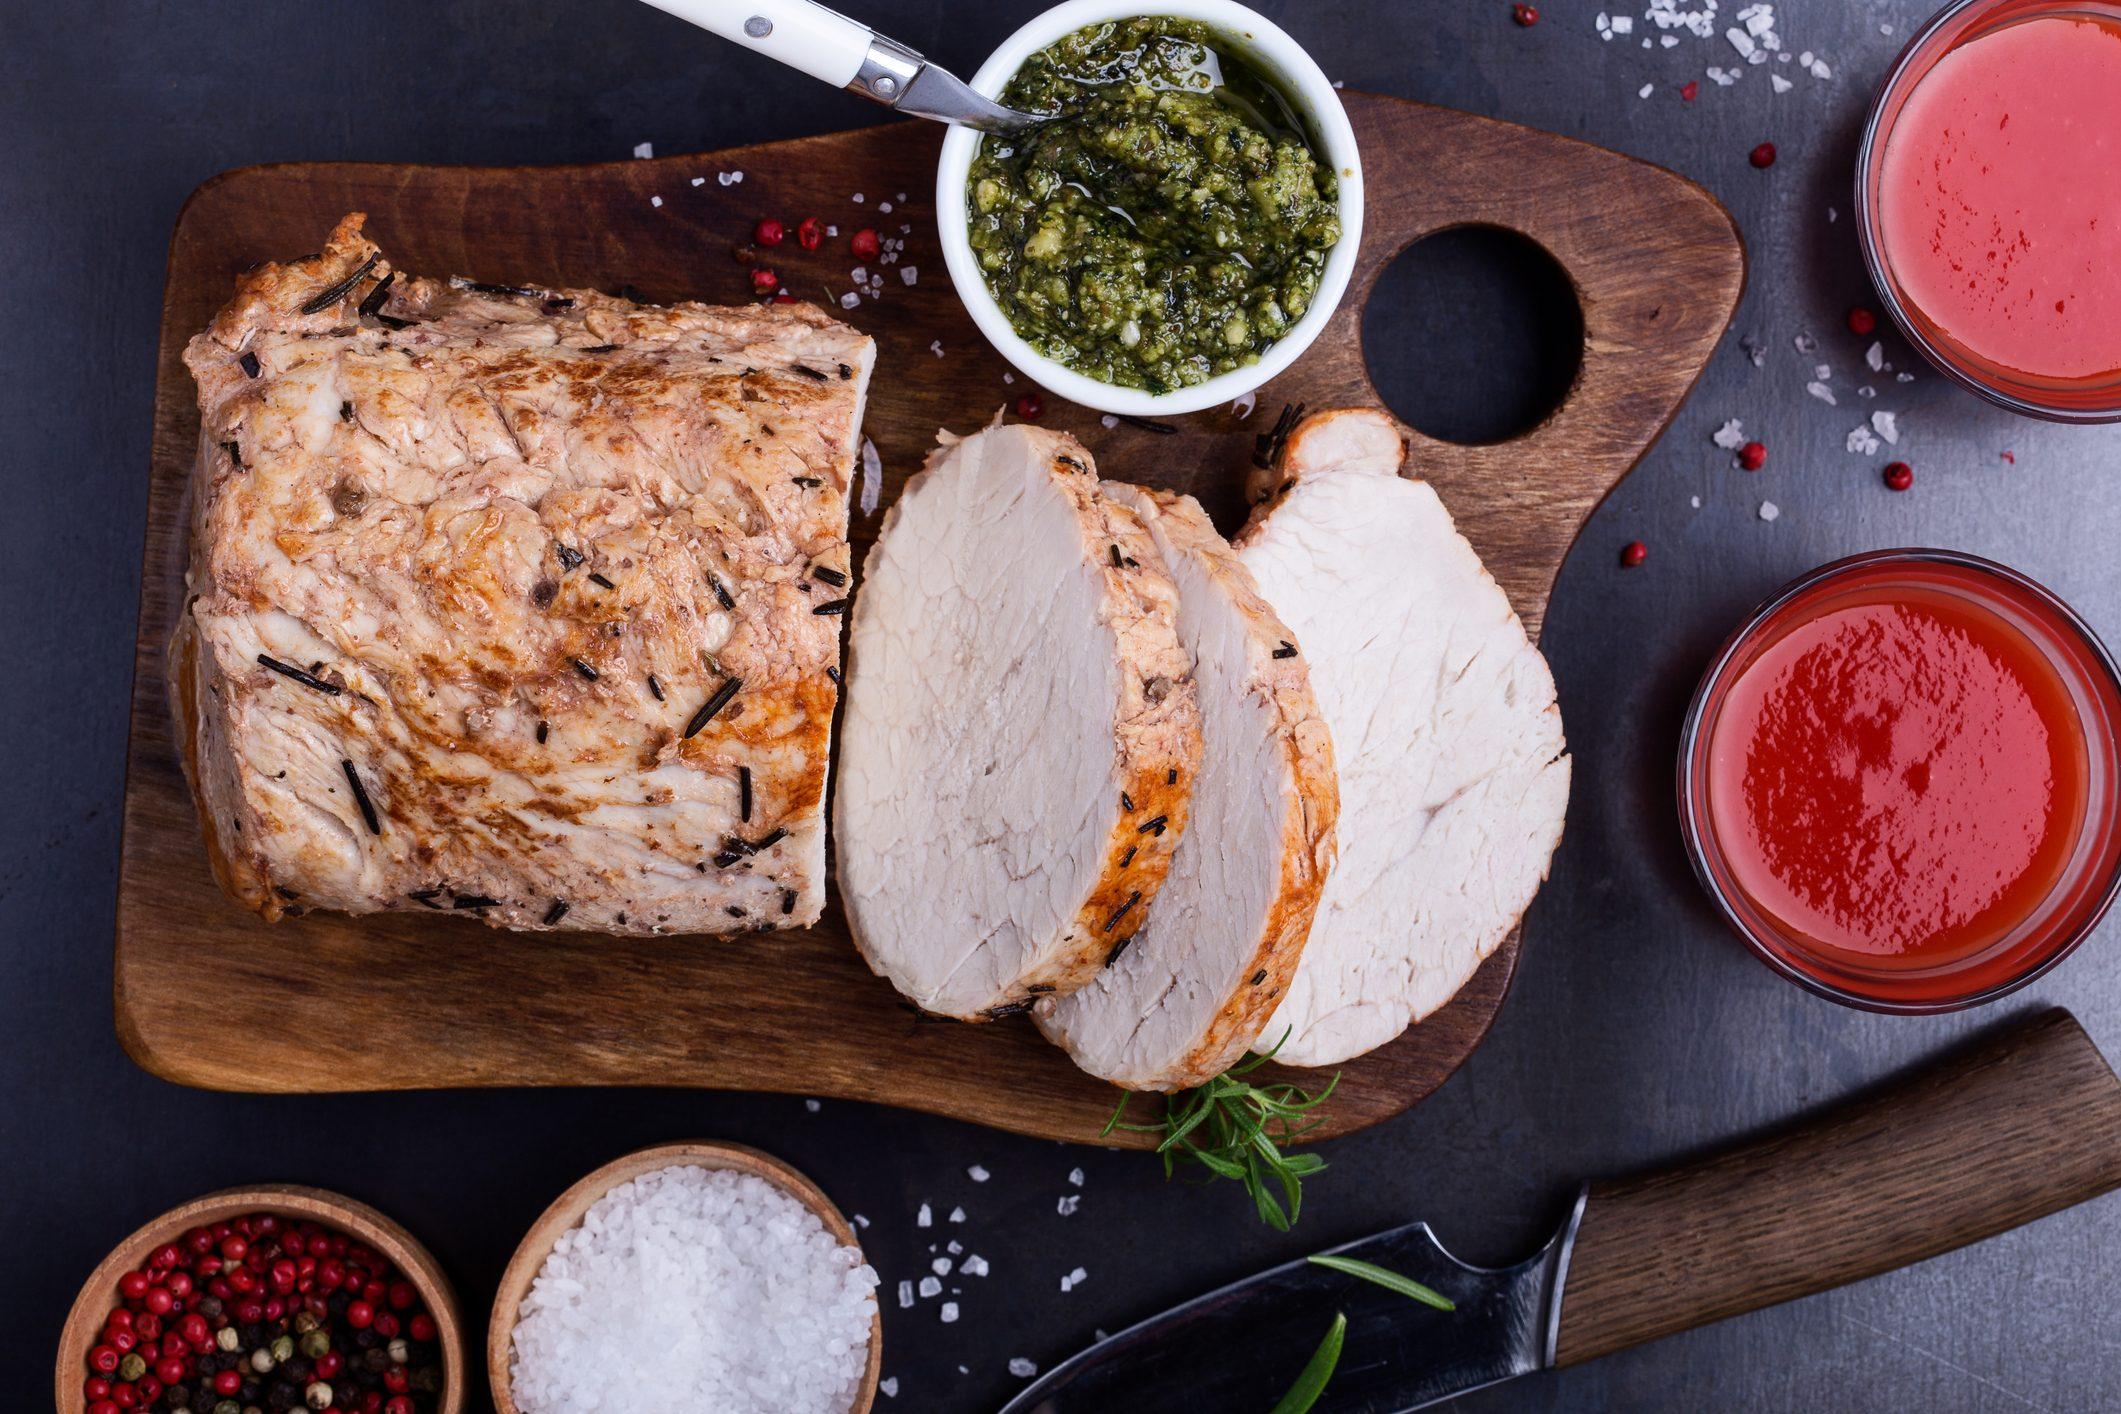 Herb roasted pork loin on cutting board